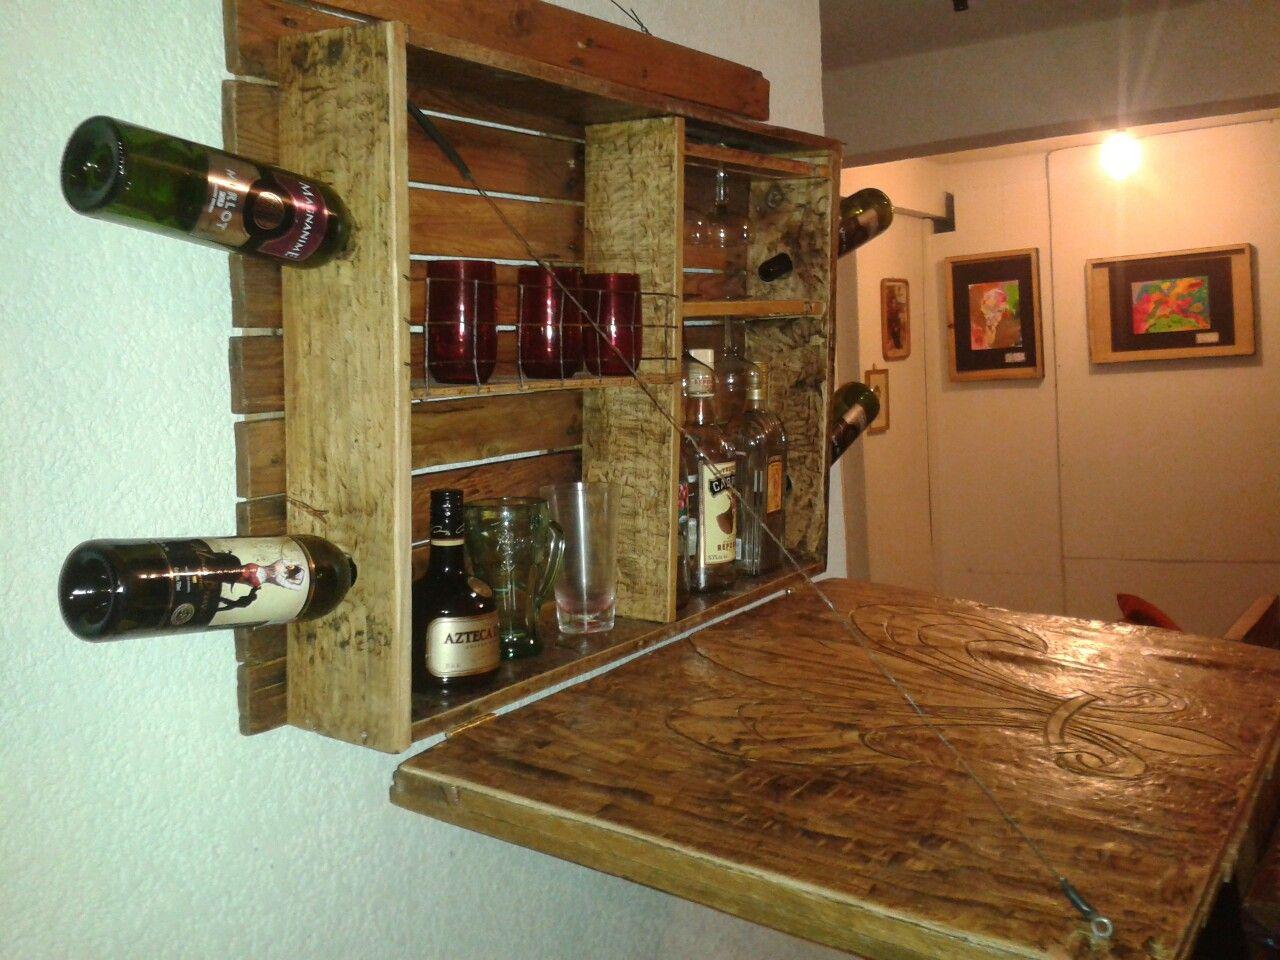 Cantina bar de pared tipo rustica con porta botellas for Bar madera rustica